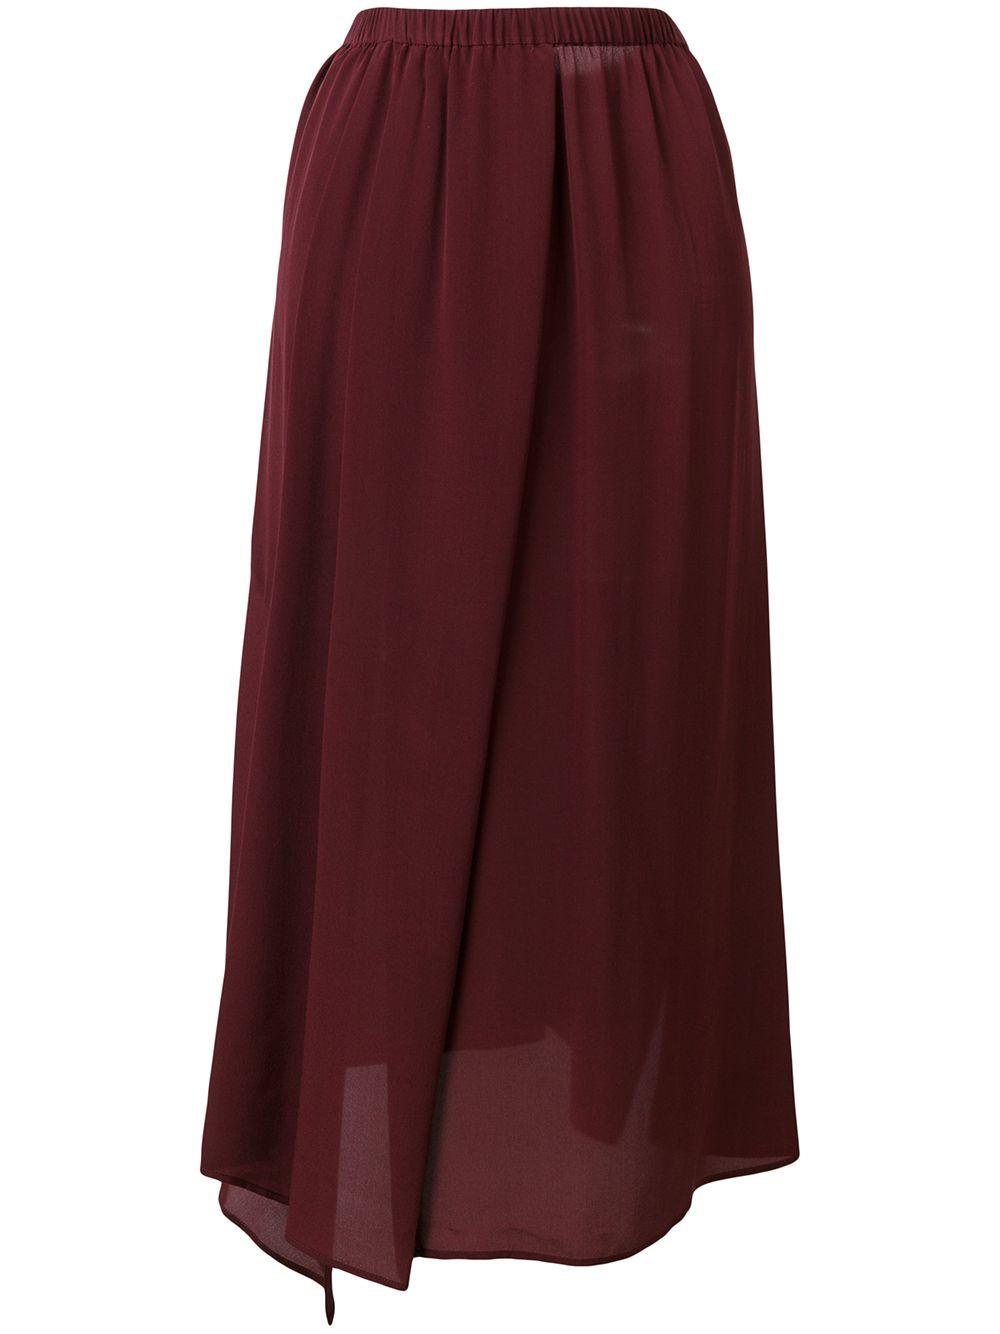 Christian Wijnants | асимметричная юбка миди | Clouty